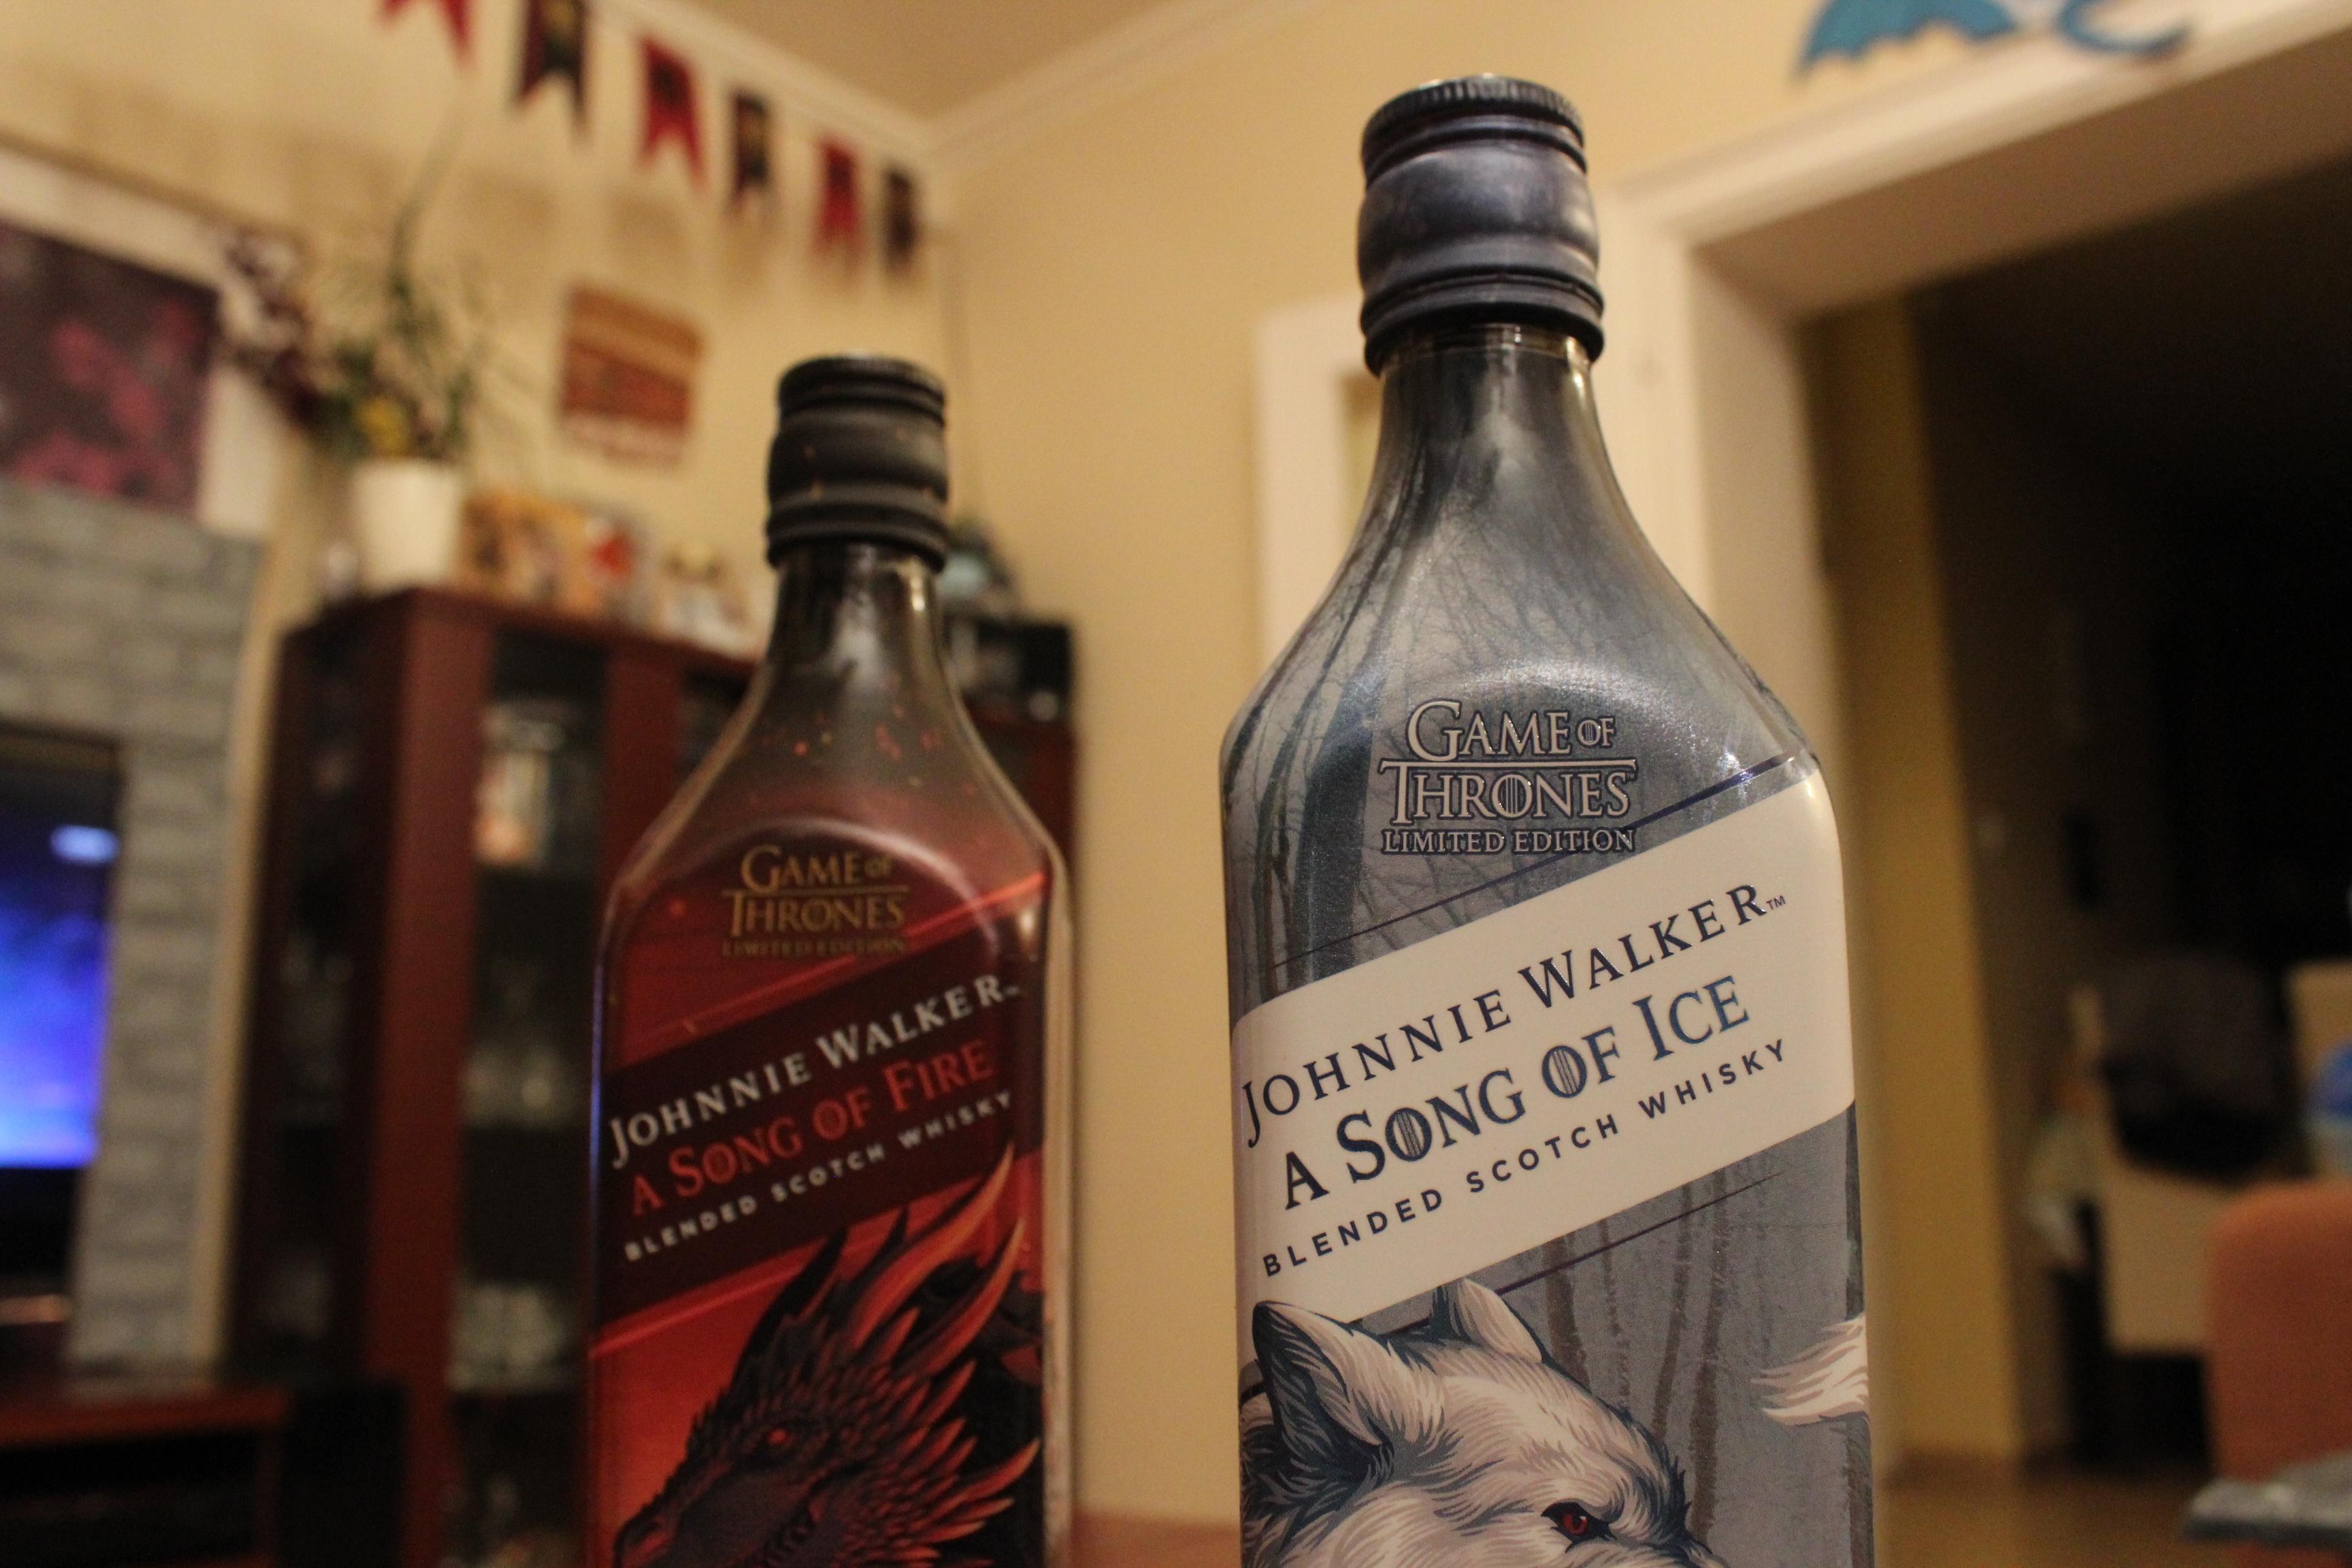 szmk_game_of_thrones_tronok_harca_johnnie_walker_whisky_scotch_tel_kozeleg_tuz_es_jeg_dala_hbo_8.JPG